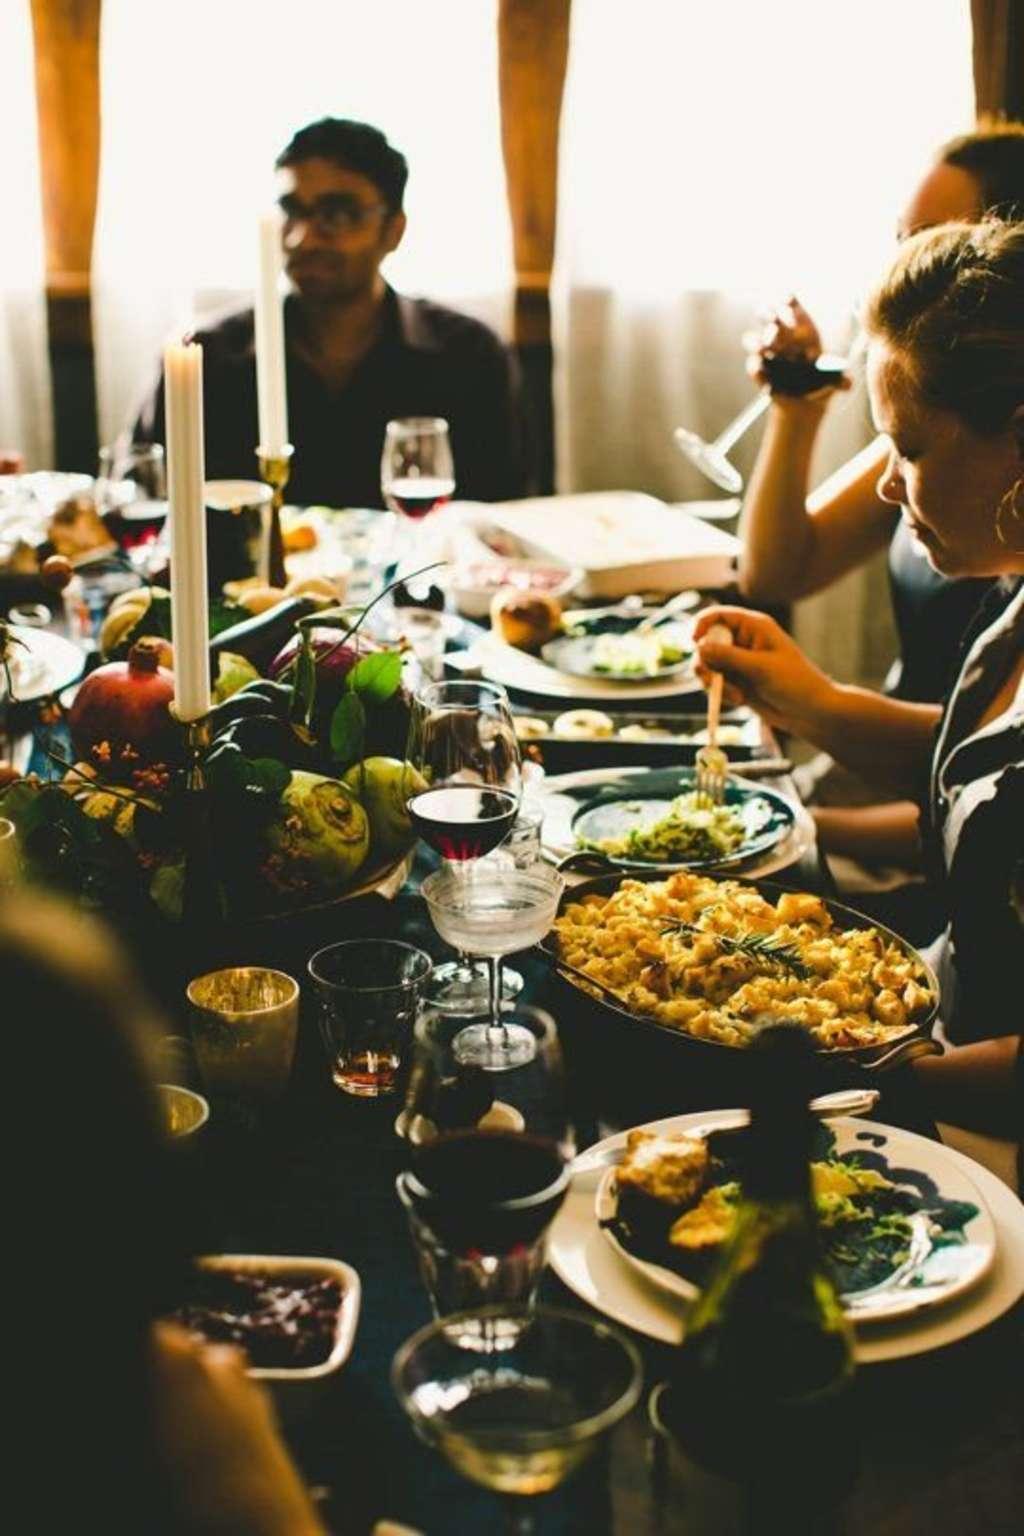 Beyond the Bottle: 3 Fresh Ideas for Host/Hostess Gifts